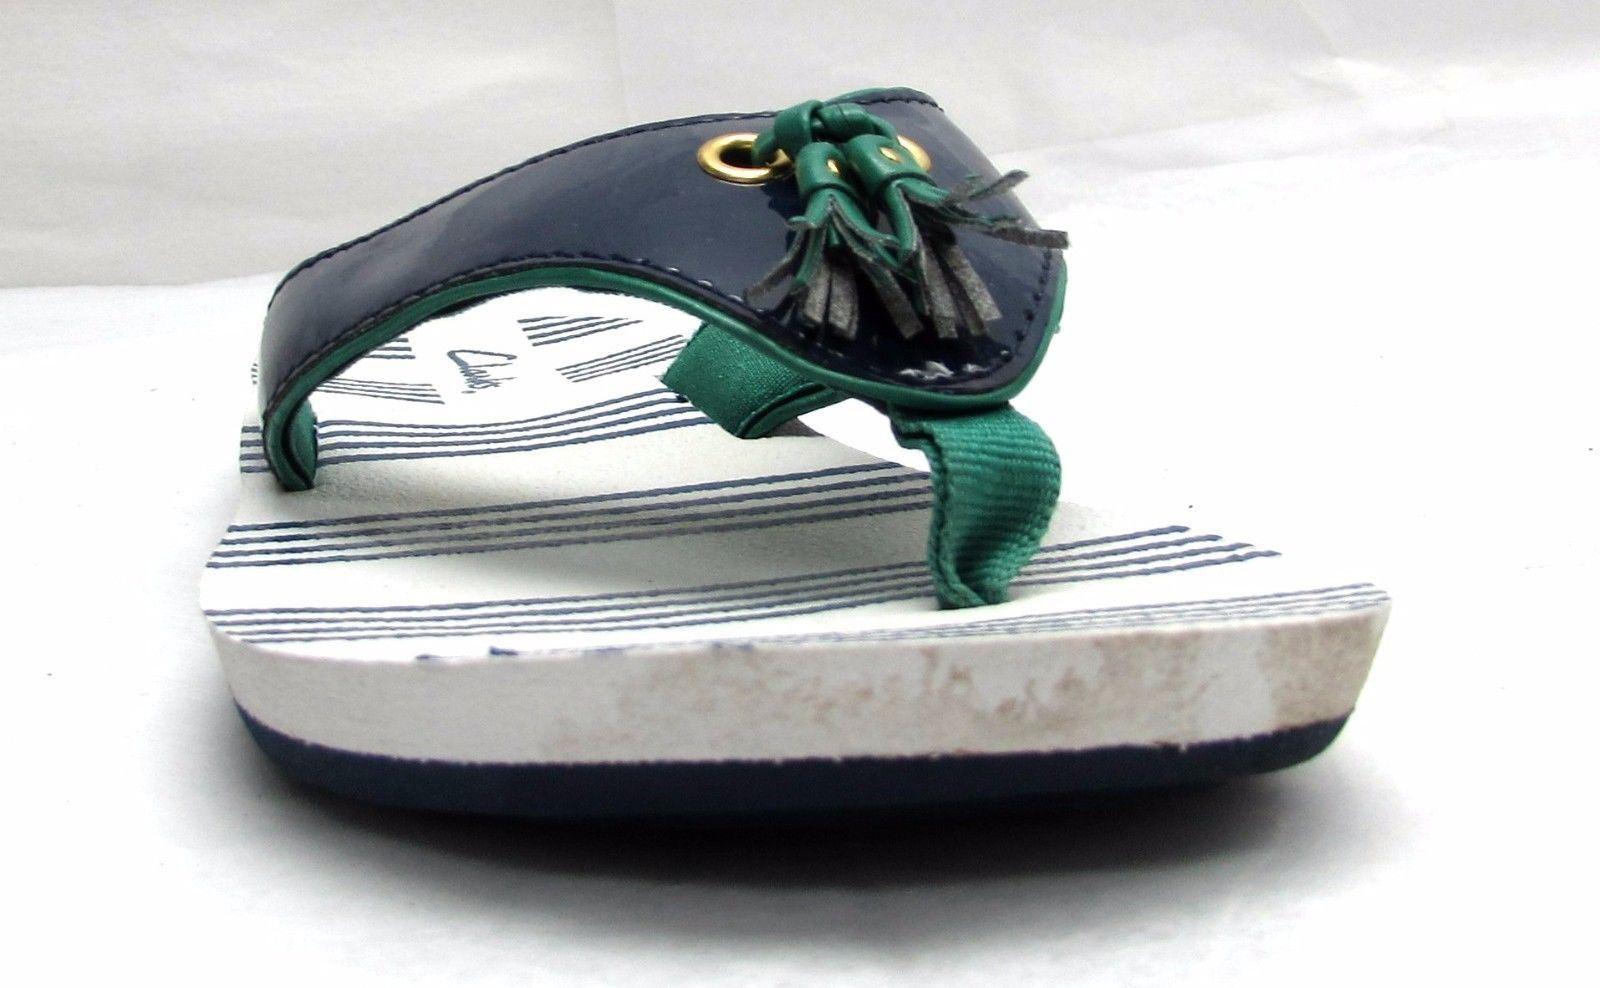 Clarks flats women's size 5 M flats Clarks sandals comfort shoes blue flip flops tassels fb1a2b